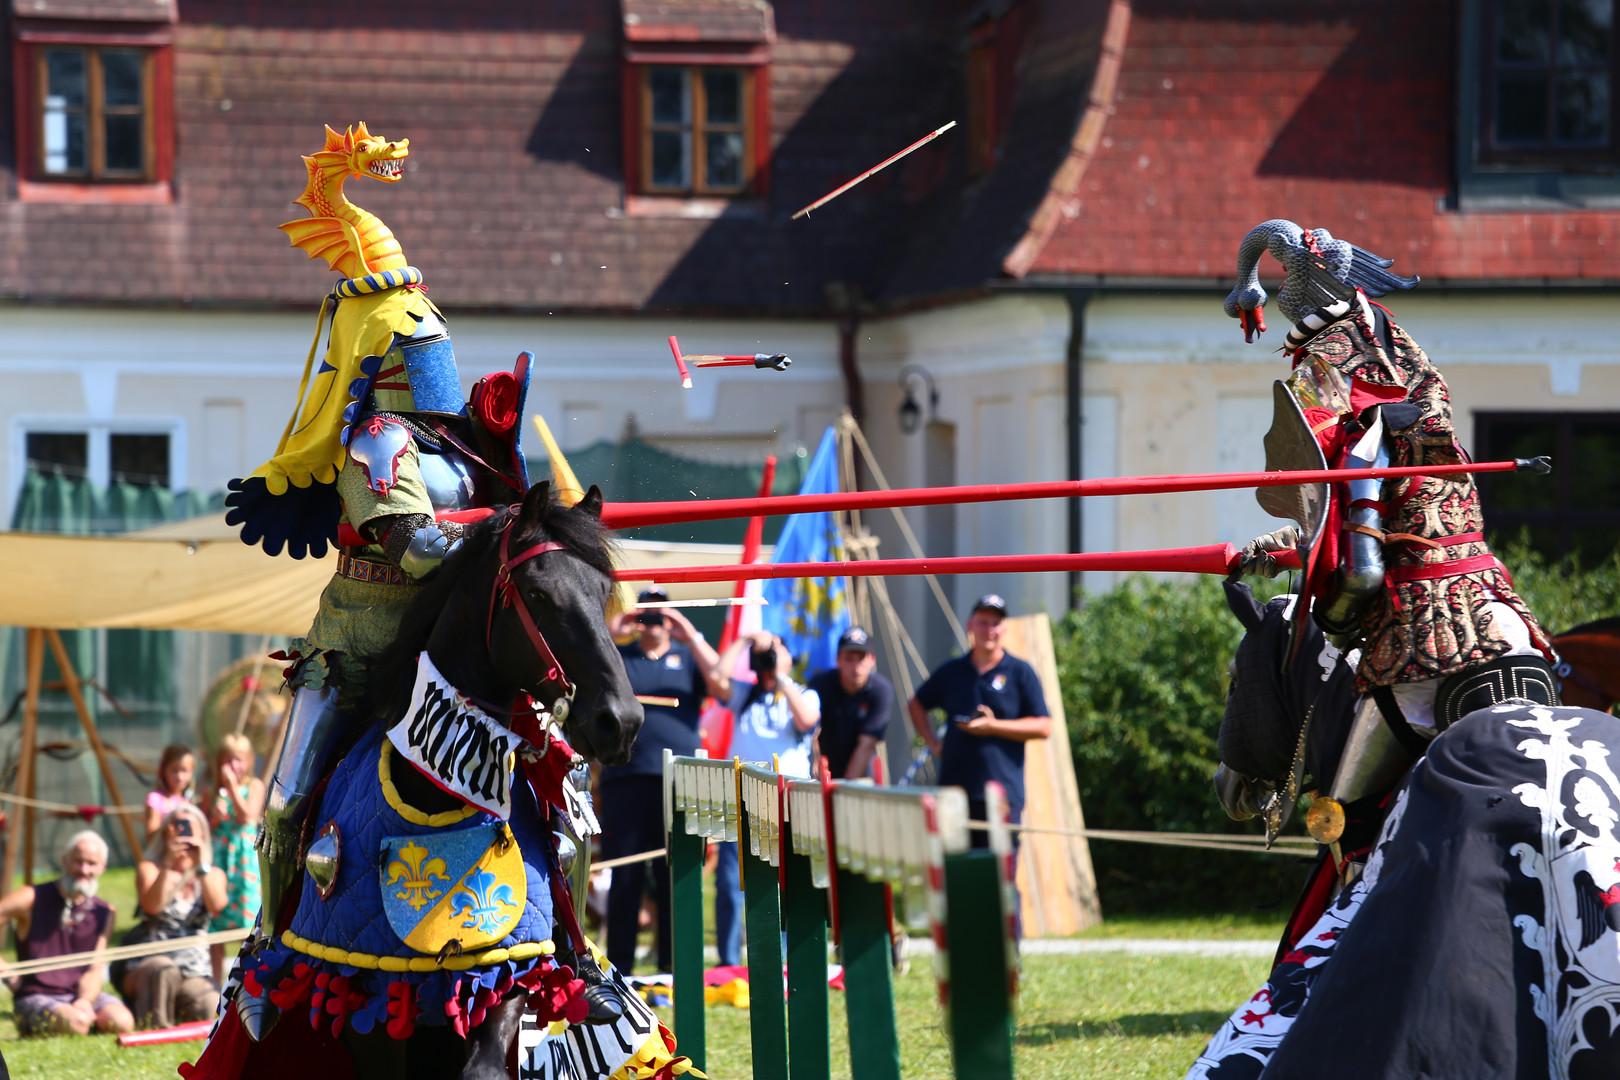 Kampfszene - Ritterturnier zu Pferde, 2018